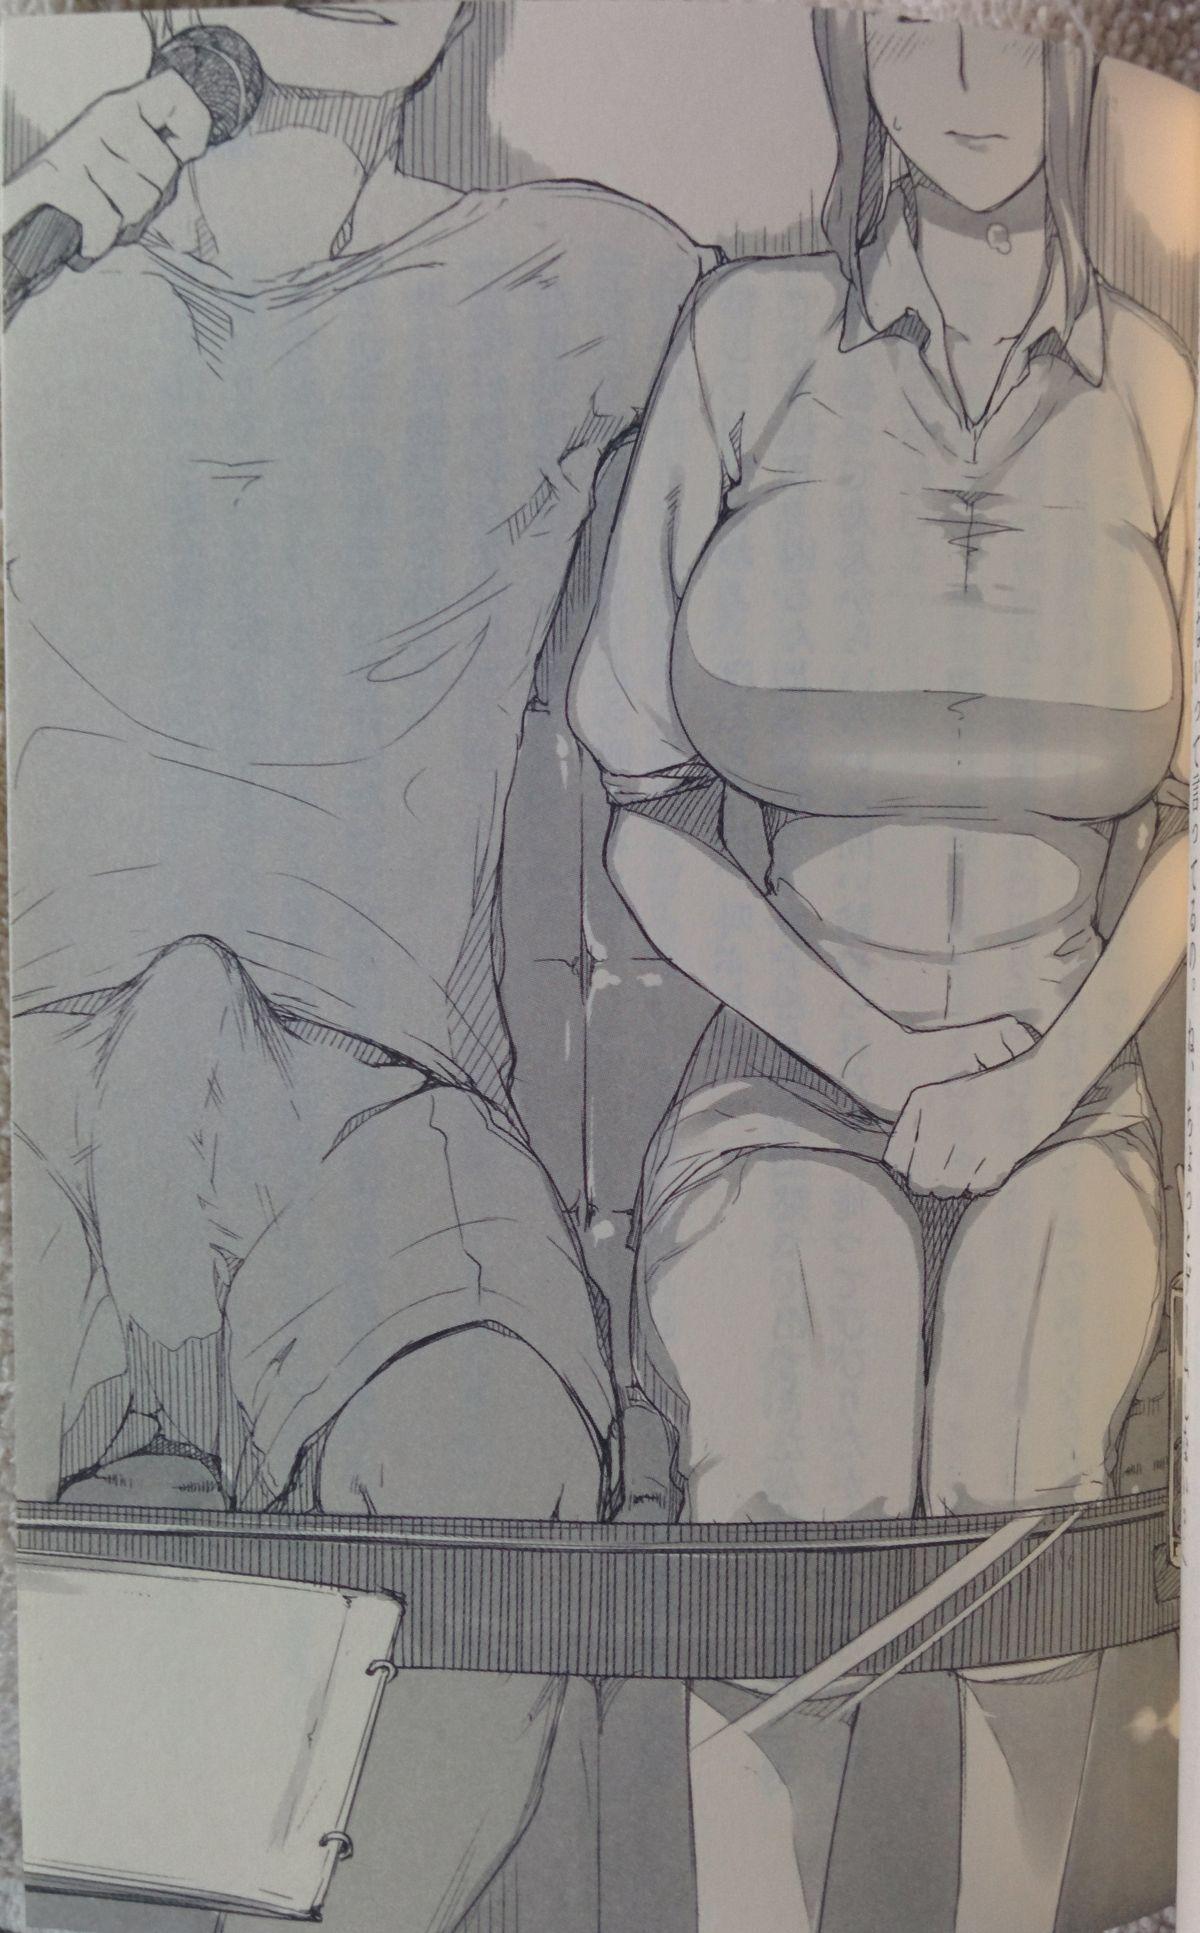 MTSP Tachibana Household's affairs with men 16